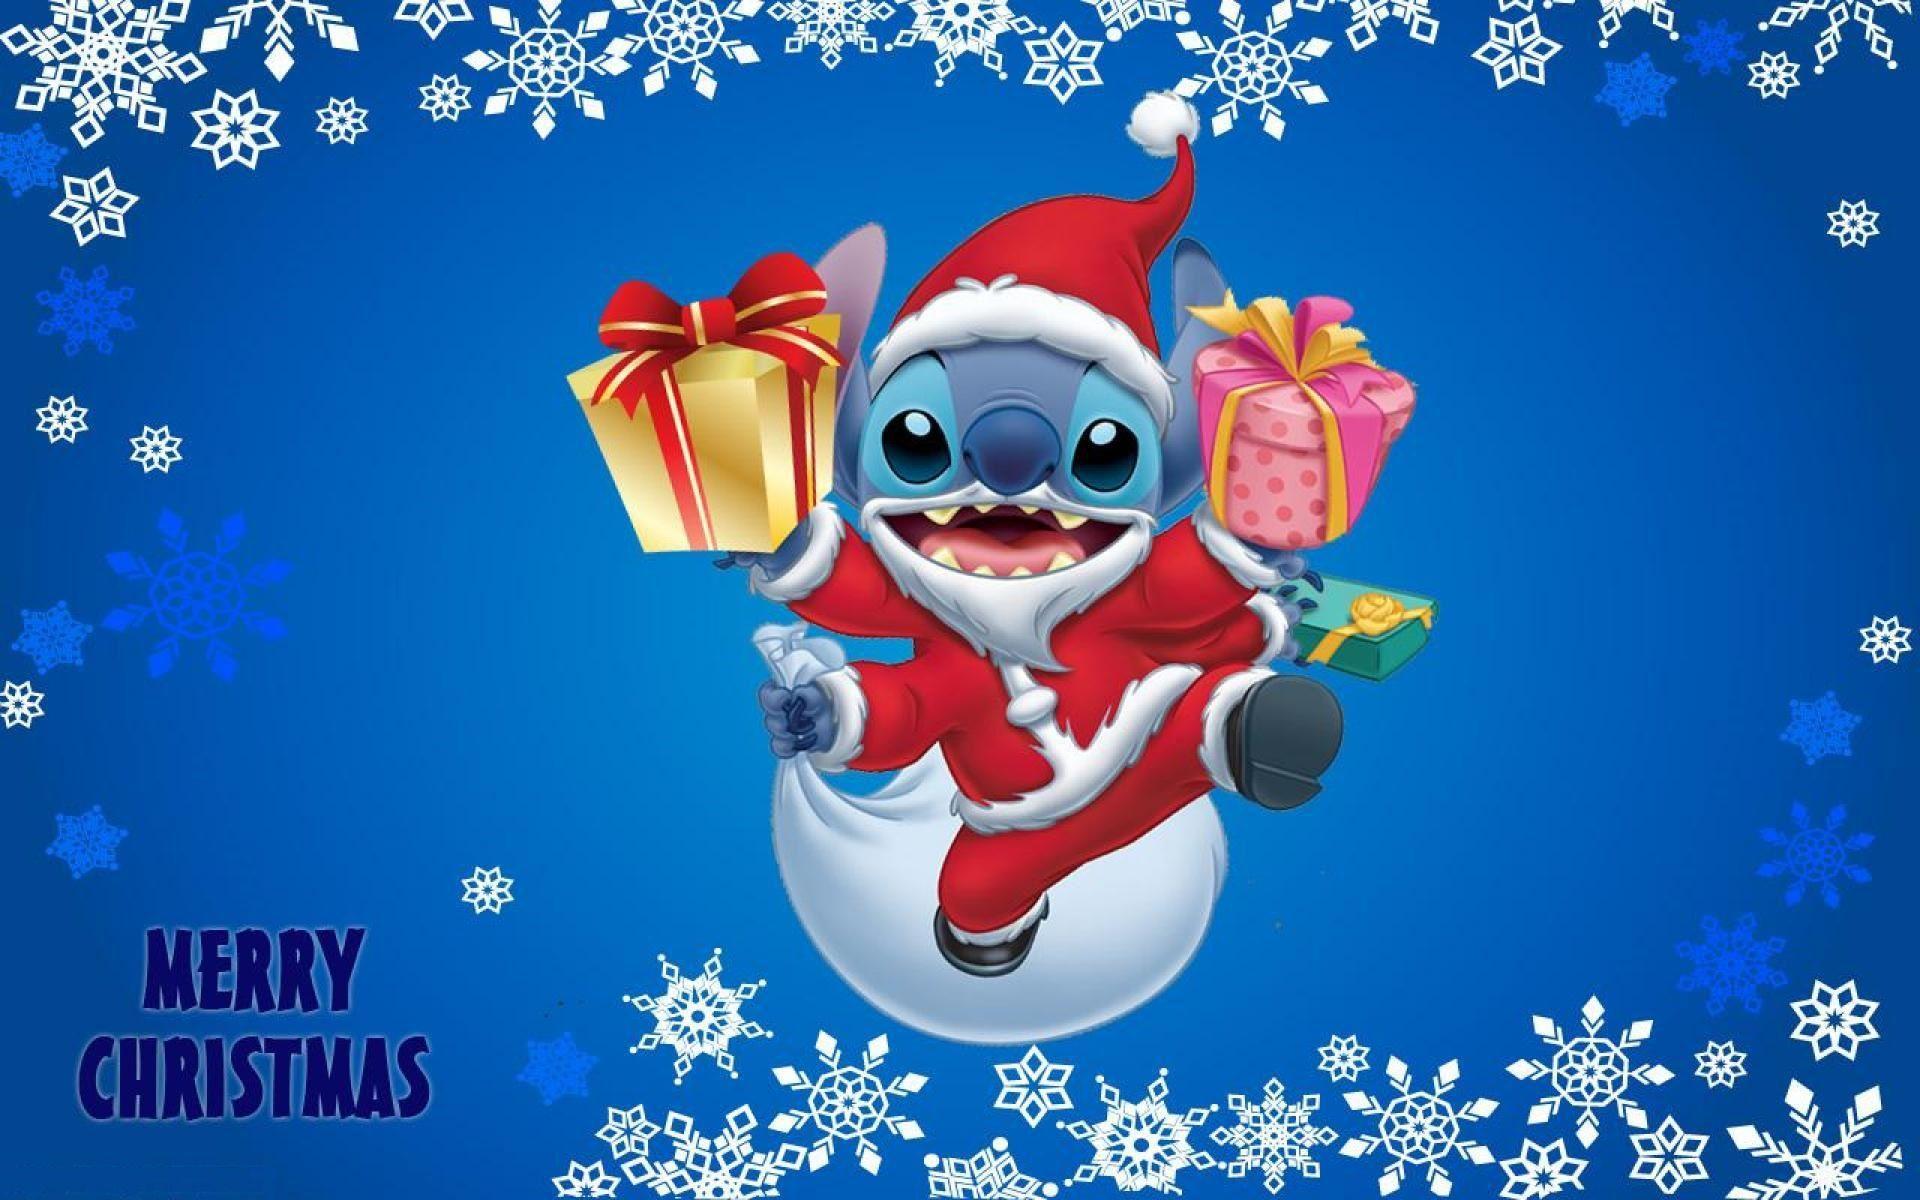 Cute Disney Christmas Wallpapers - Top